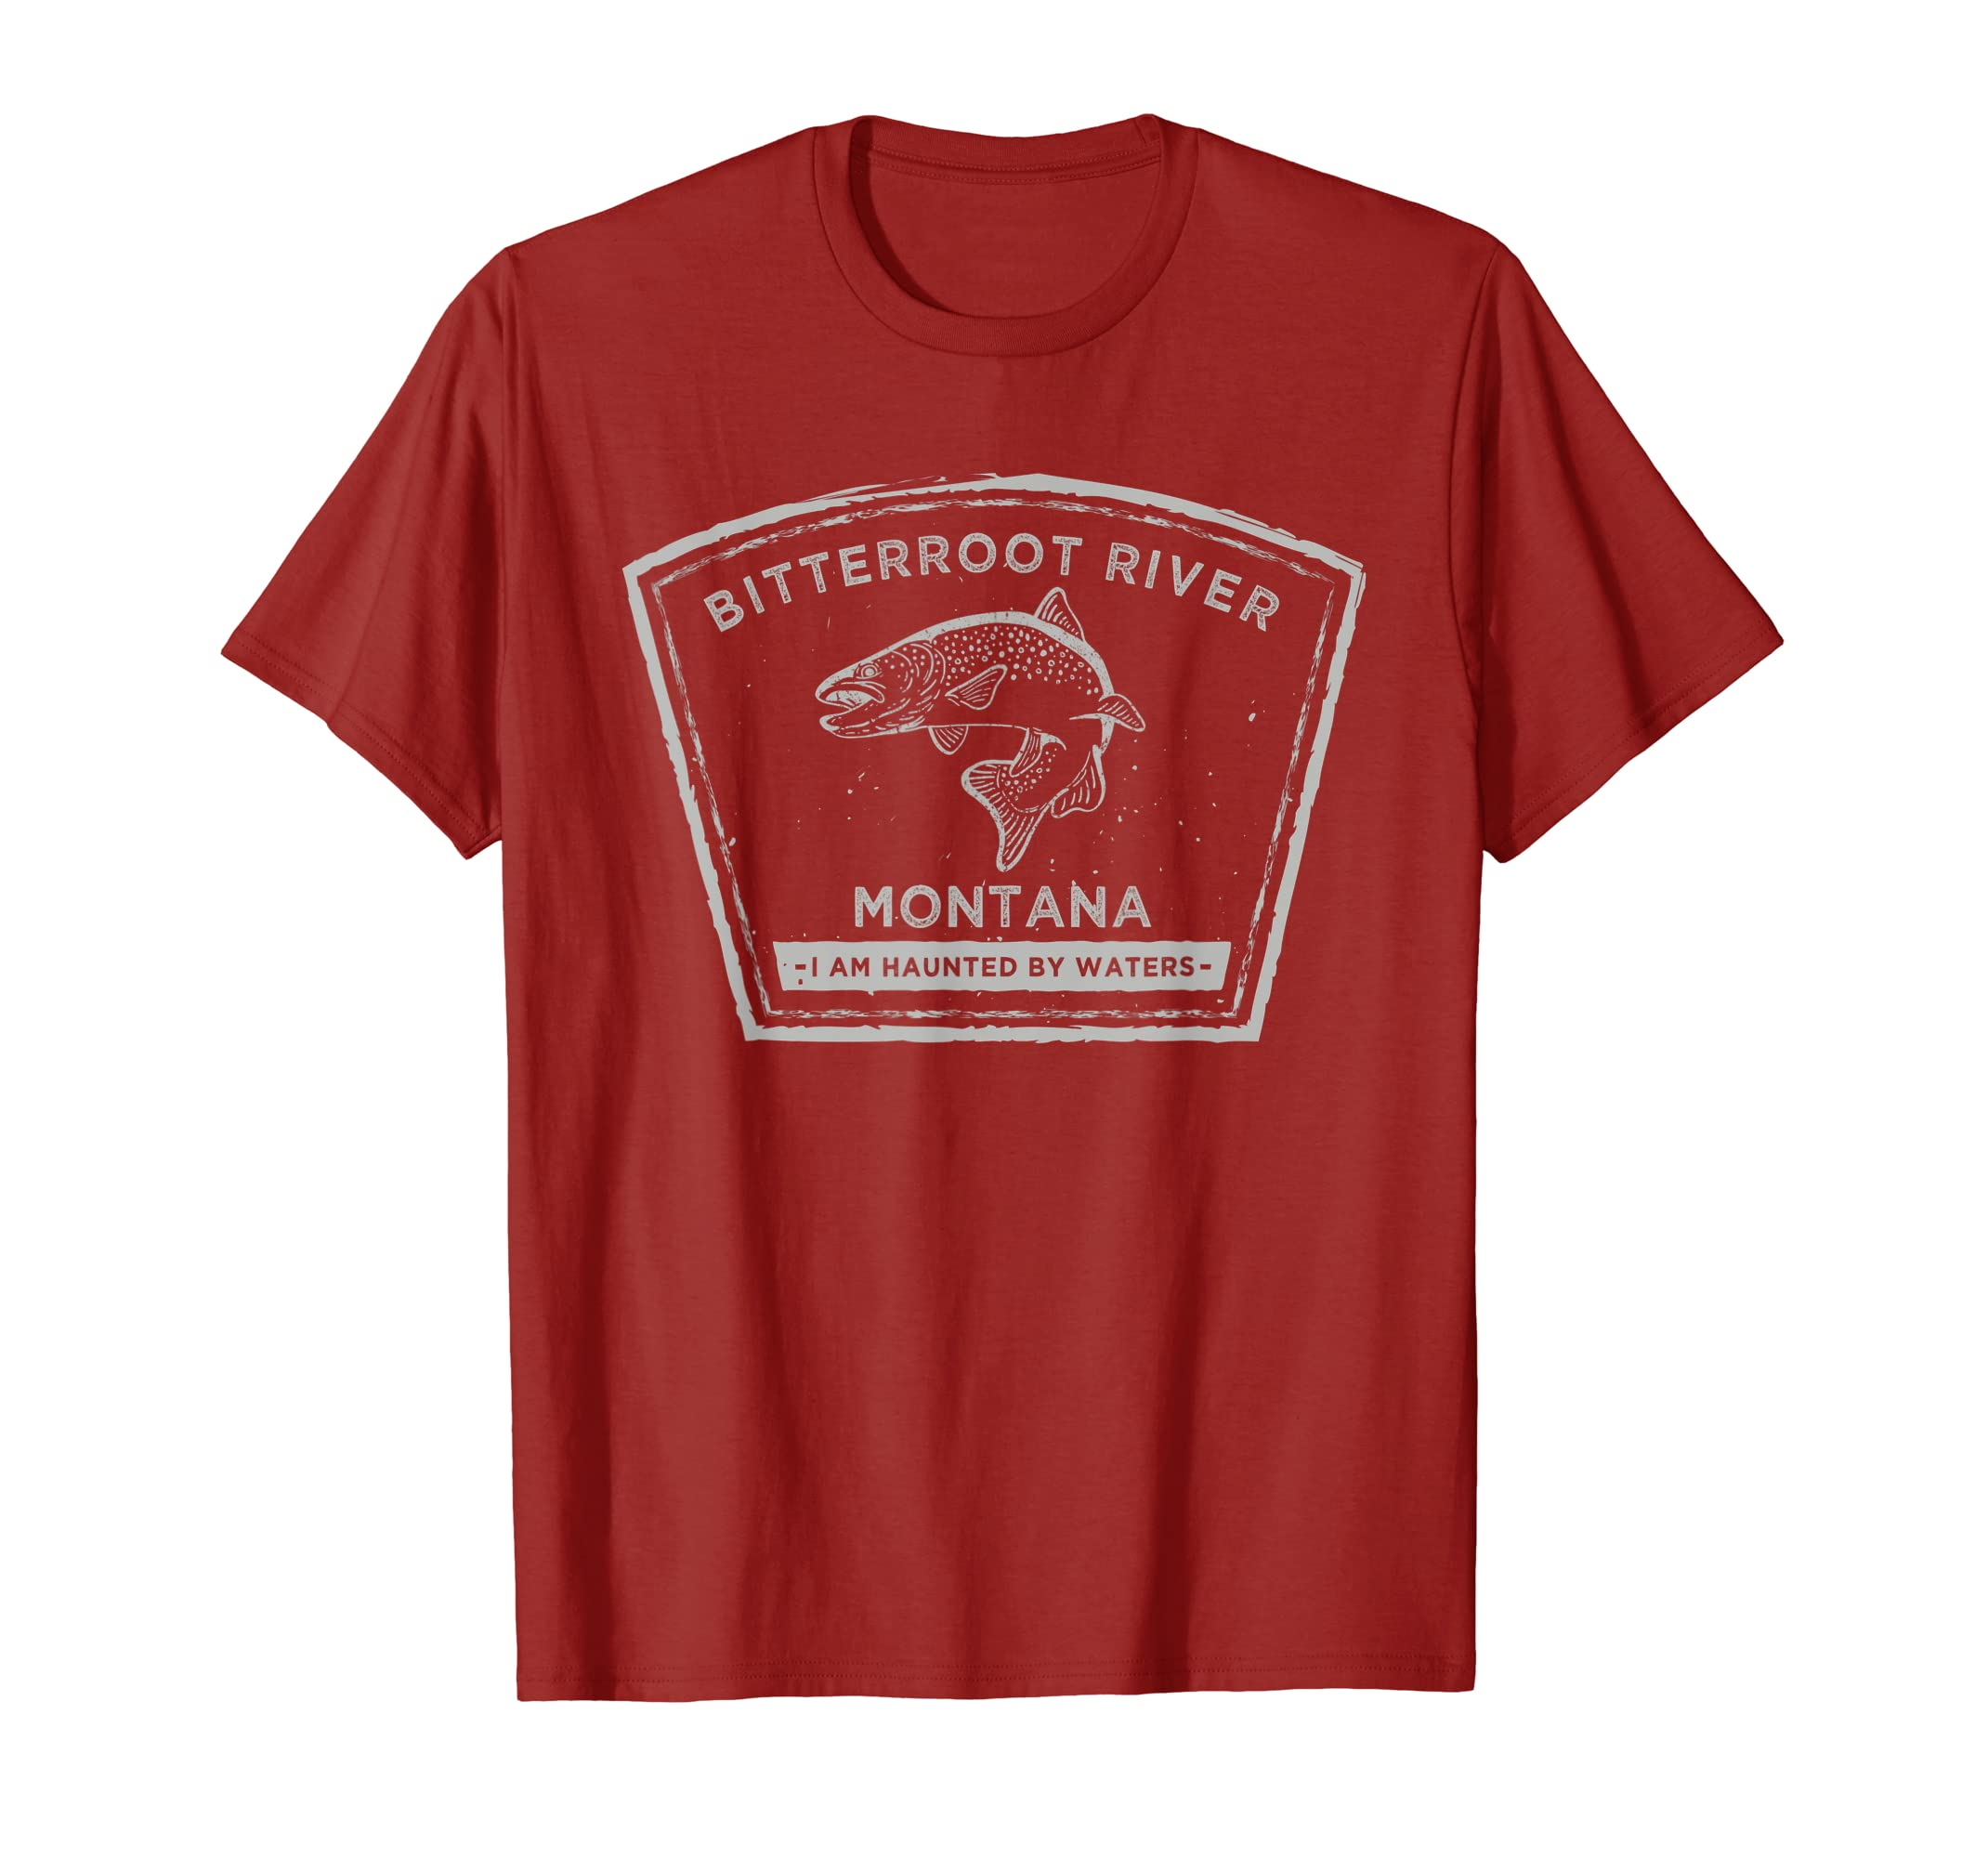 Bitterroot River Montana - Fly Fishing Shirt